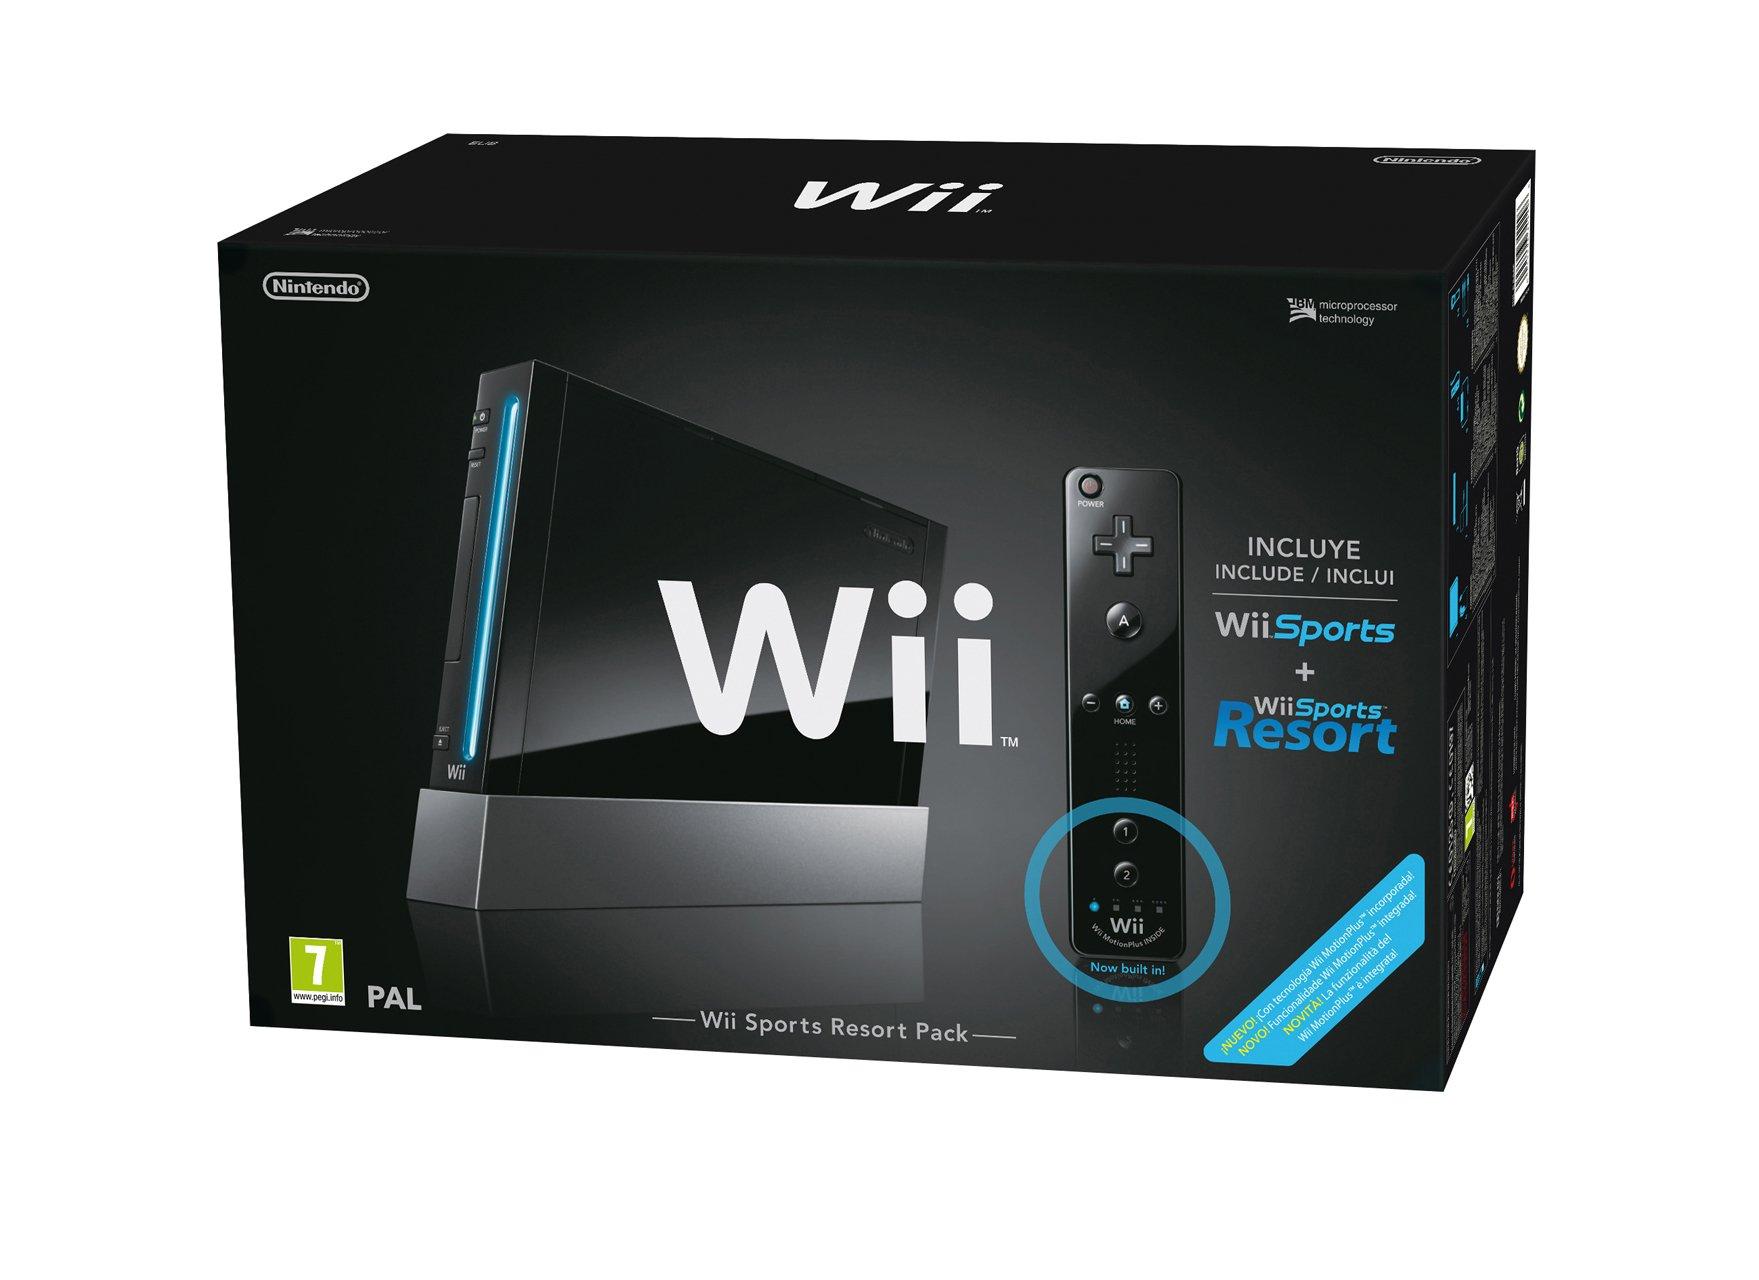 Wii Sports Resort Pak Plus - Negro: Amazon.es: Videojuegos